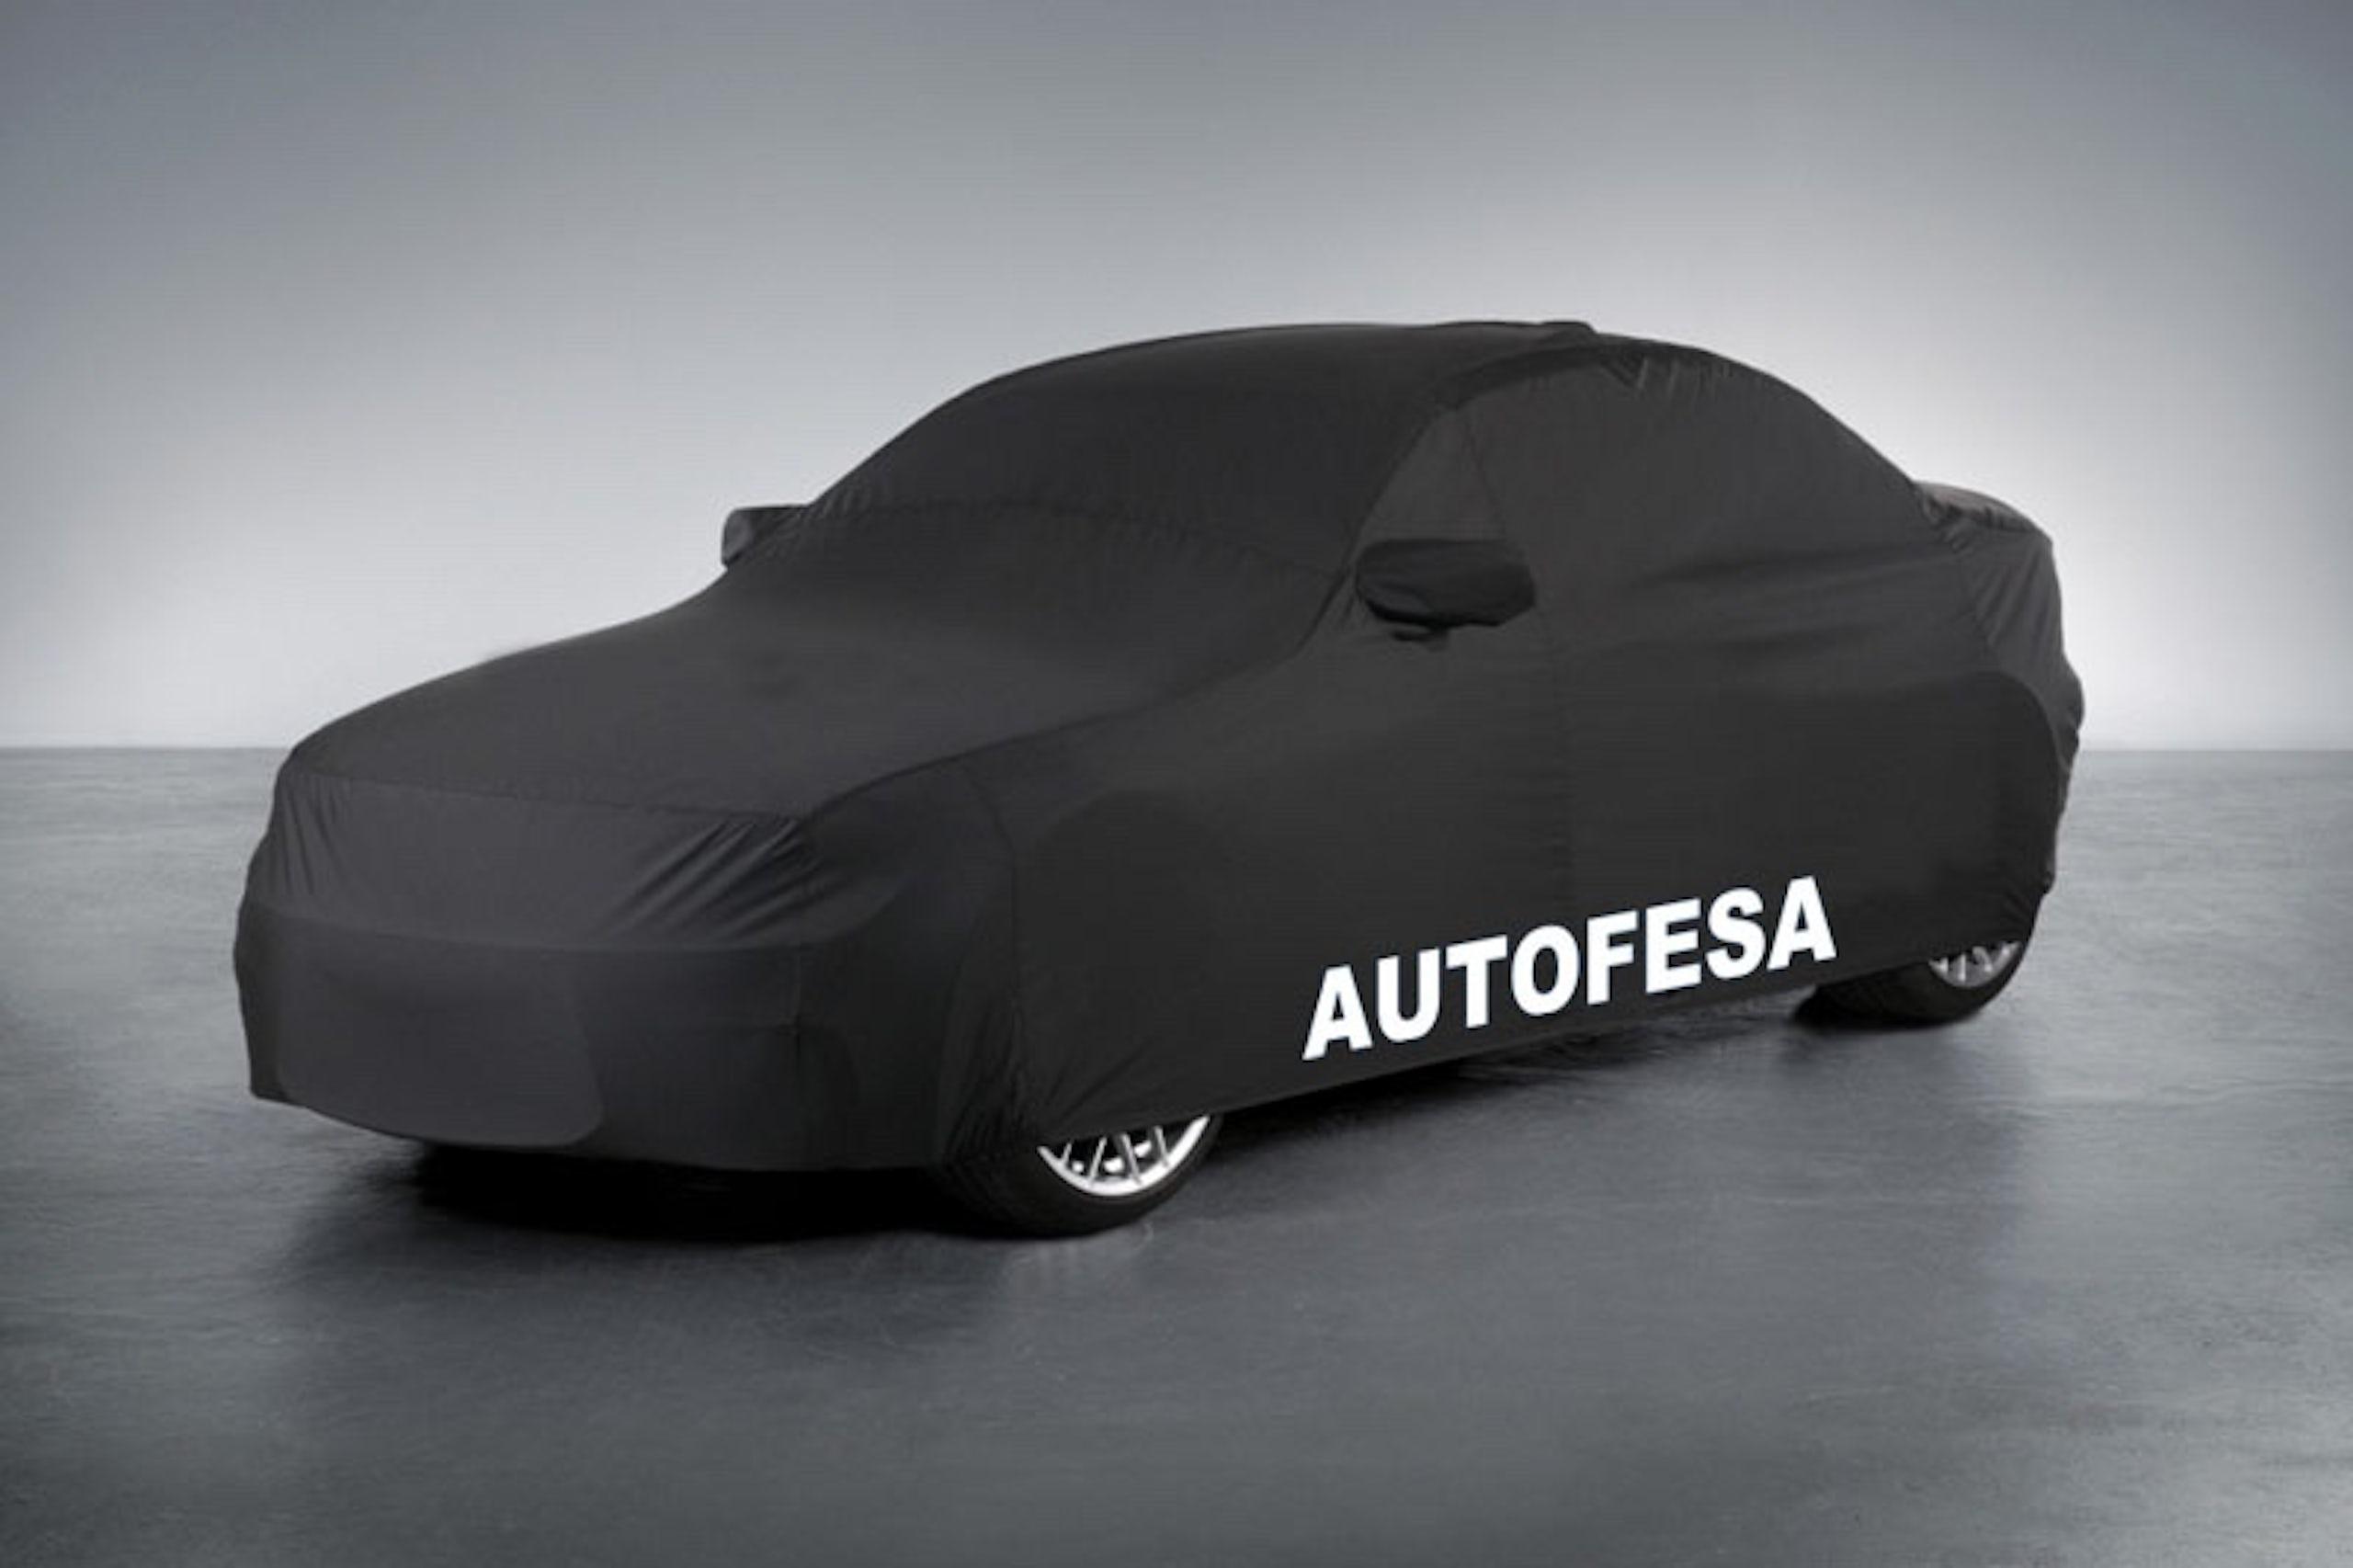 Mitsubishi Outlander 2.0 DI-D 150cv Motion 2WD 5p 7plz Auto S/S - Foto 24